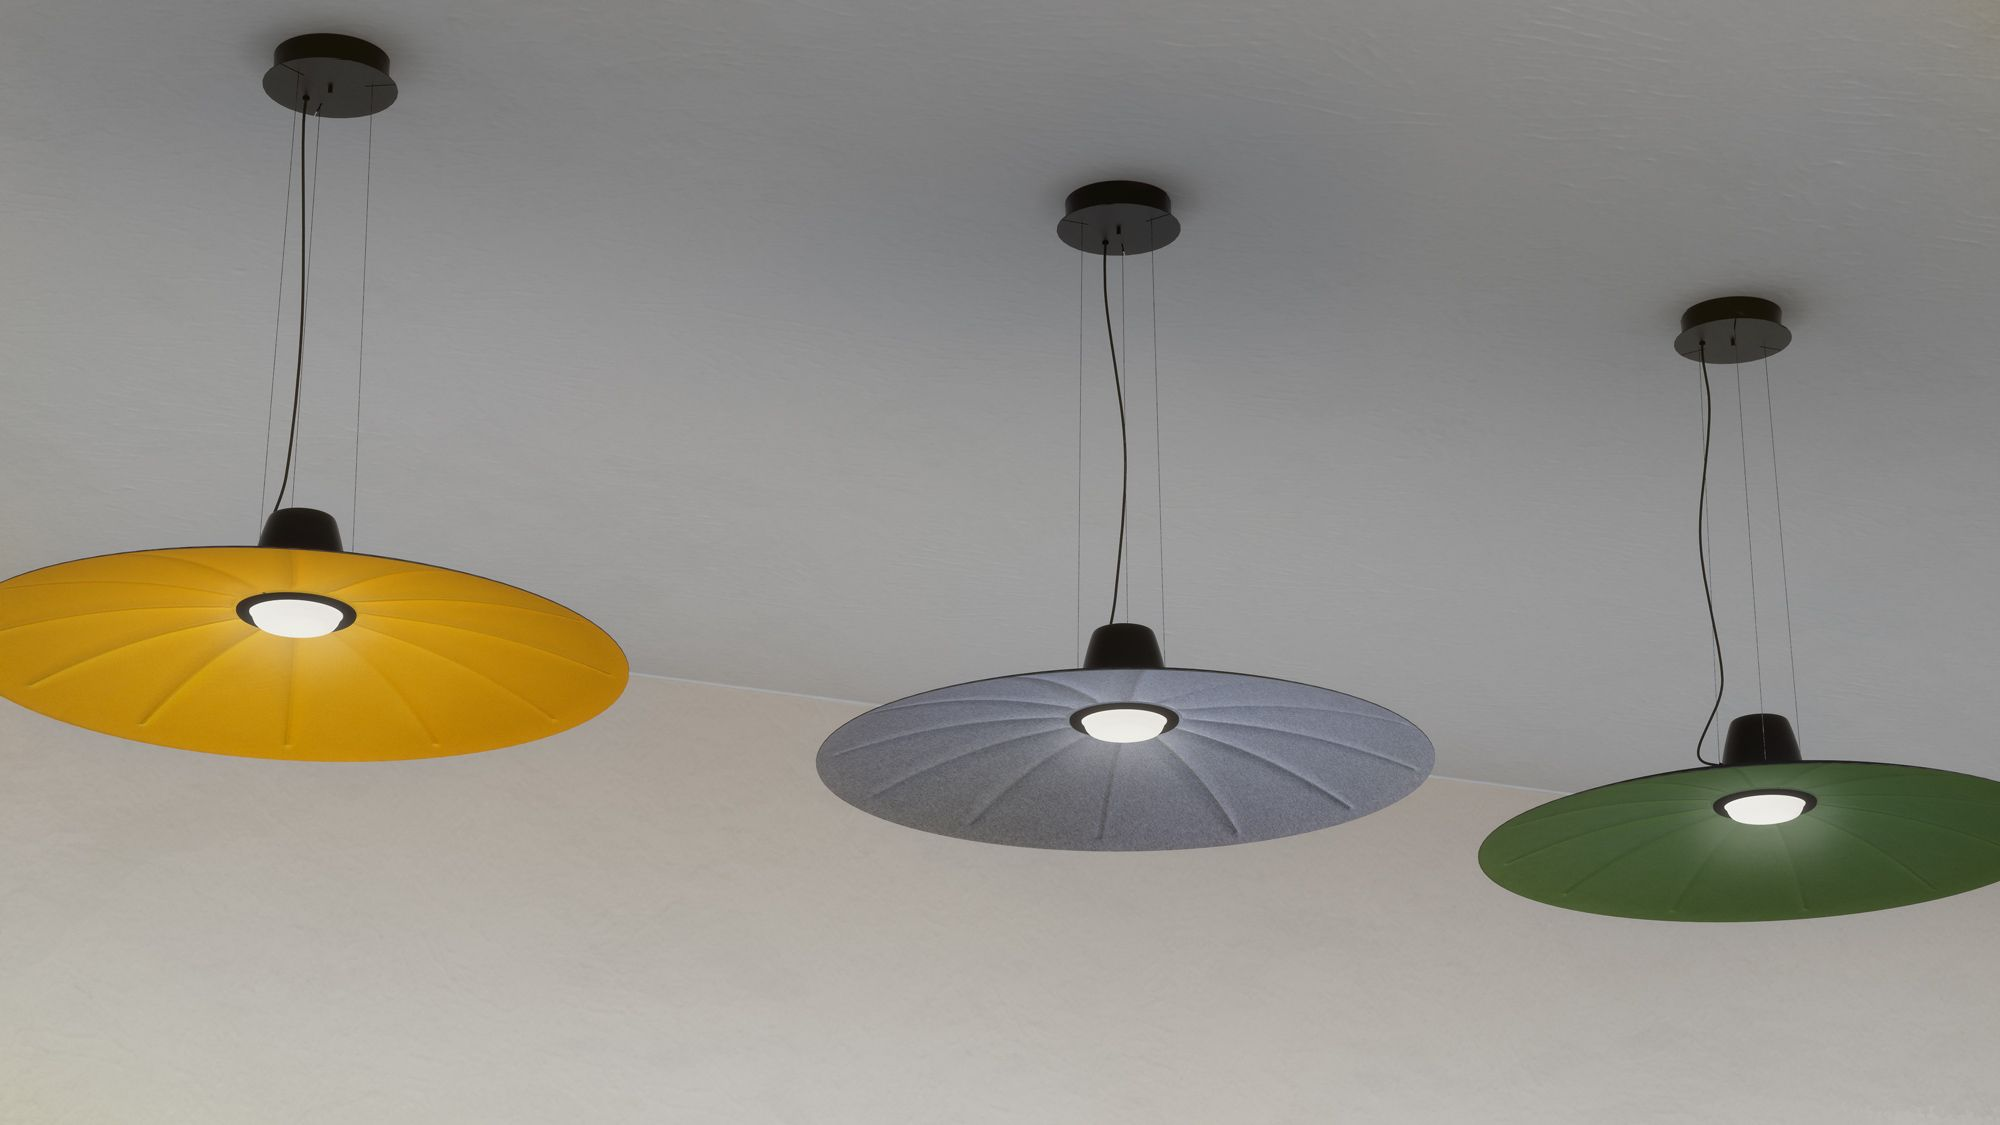 Hanging Lamp With An Acoustic Comfort Through An Aluminium